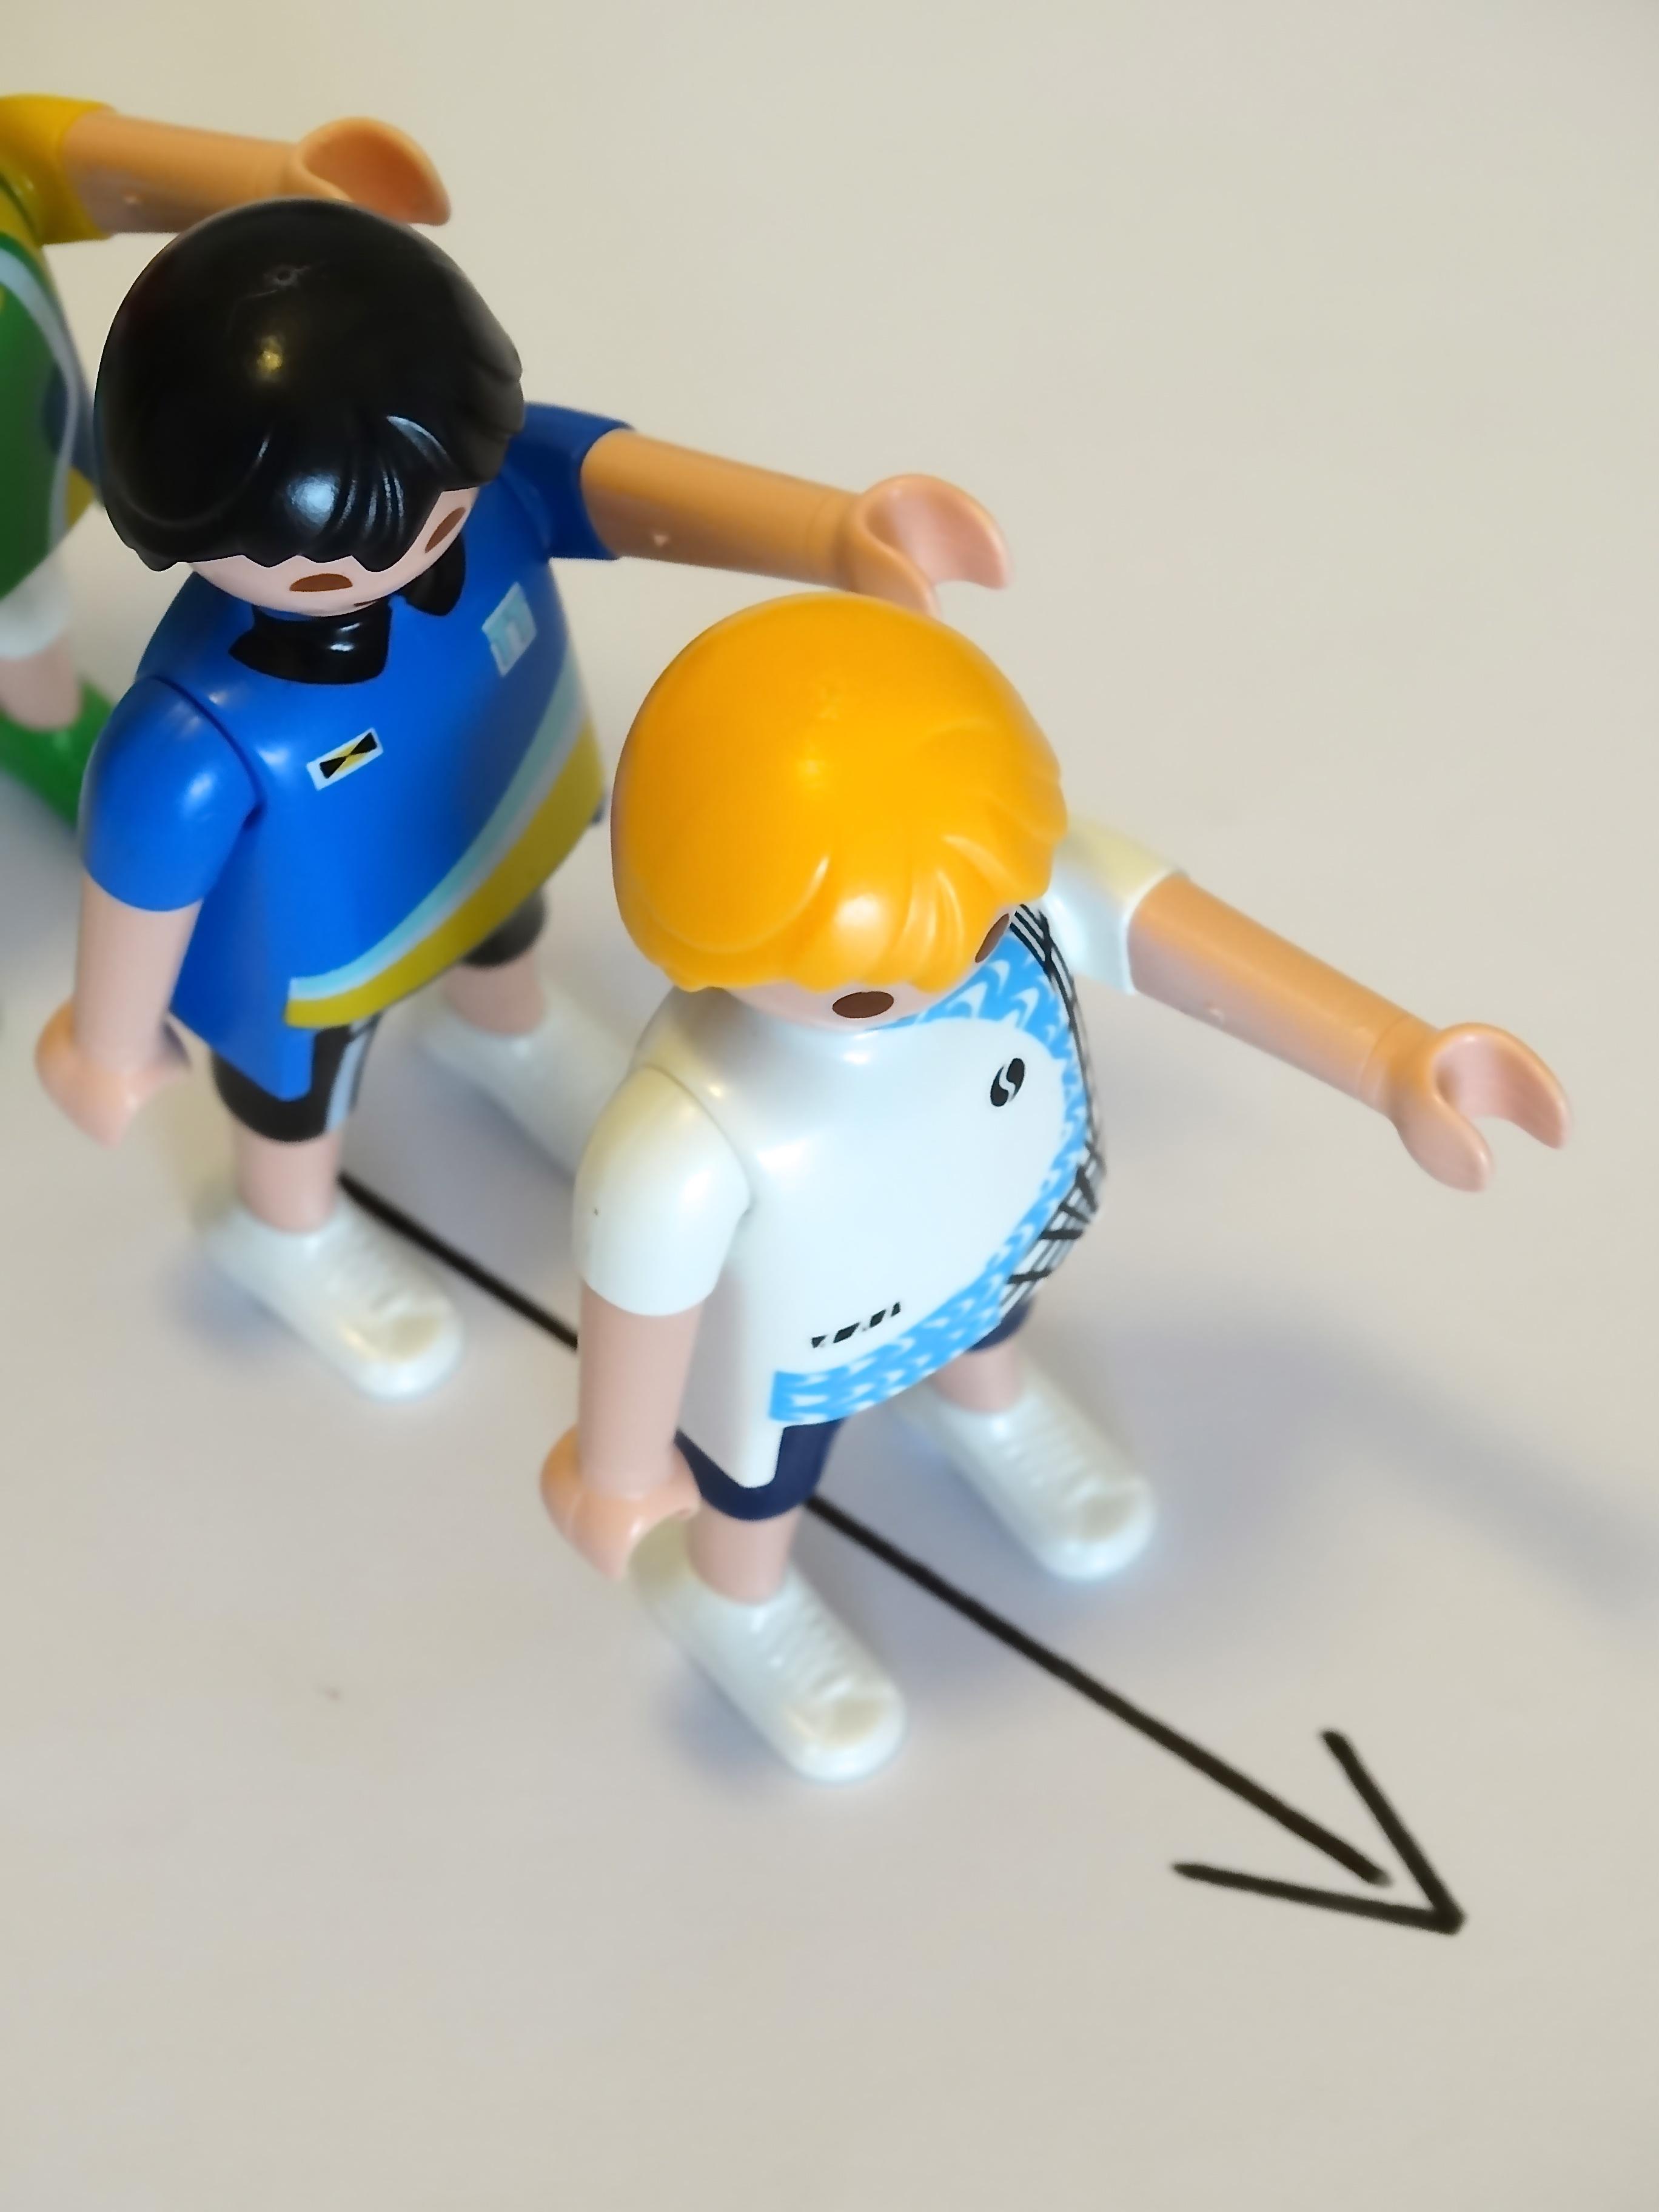 Playmobil figures toys free image